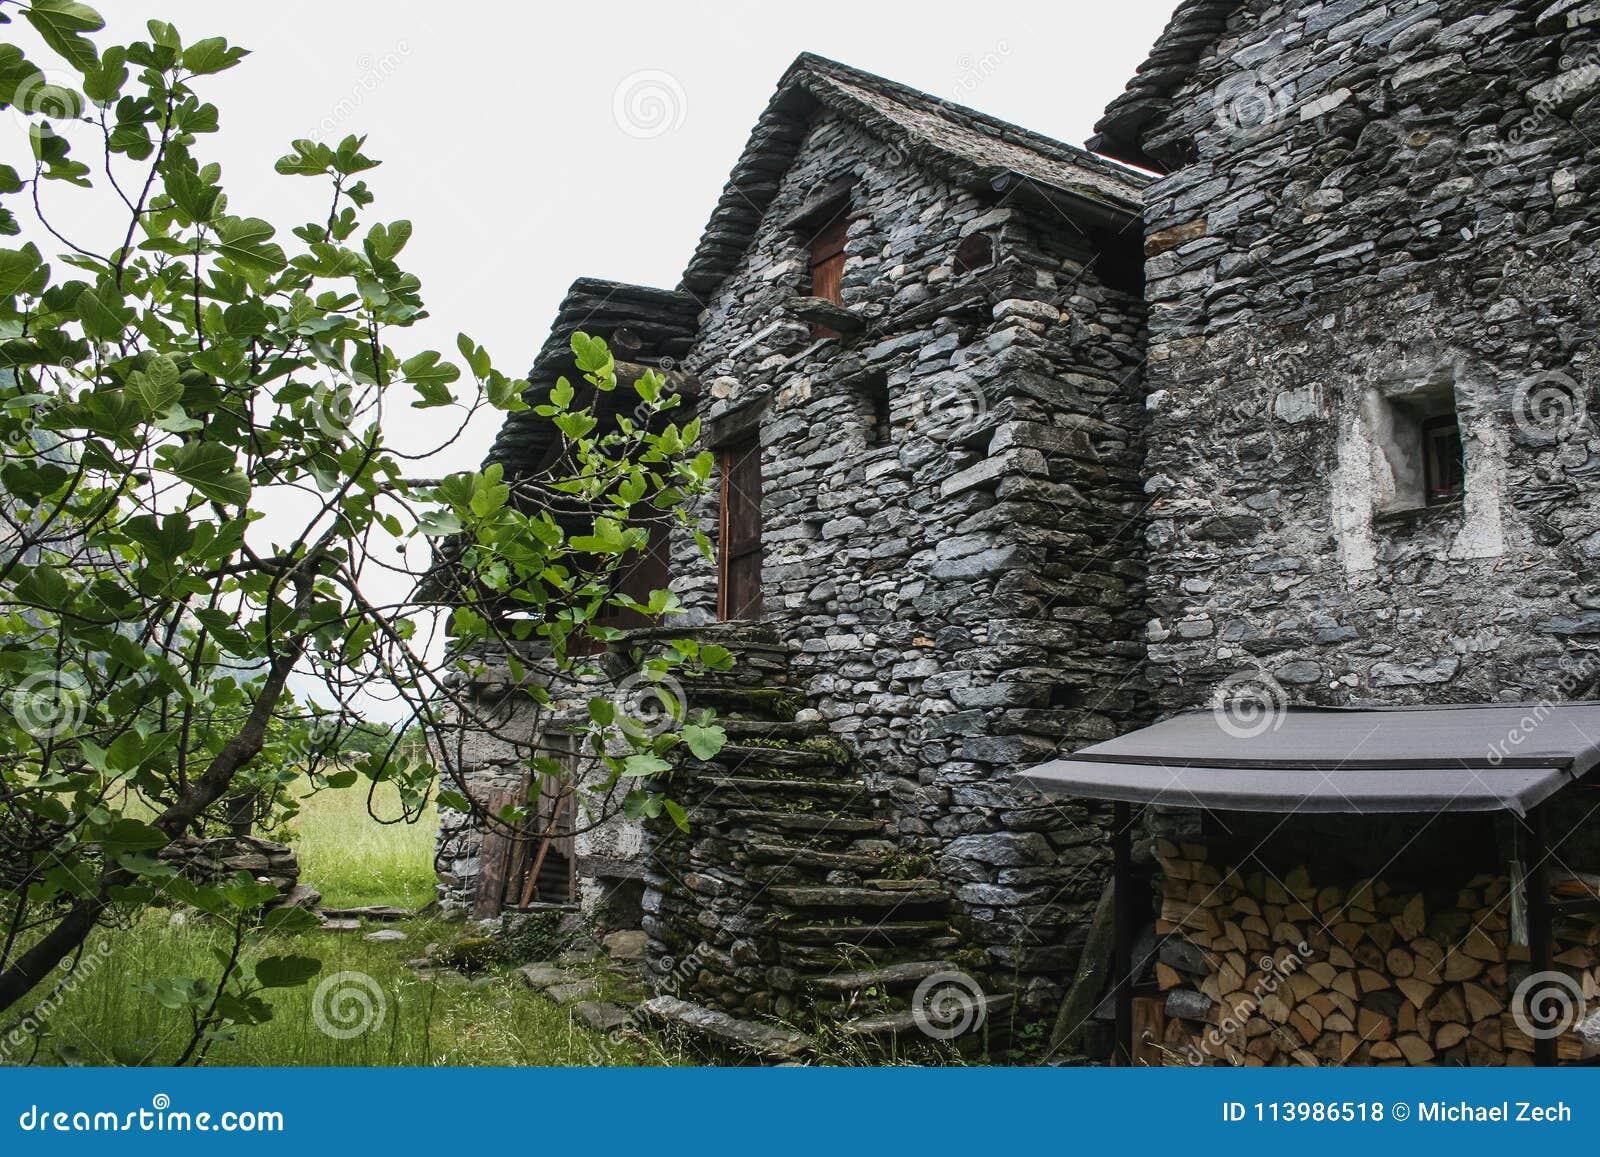 Gamla hus på maggiadaldelen av Schweiz